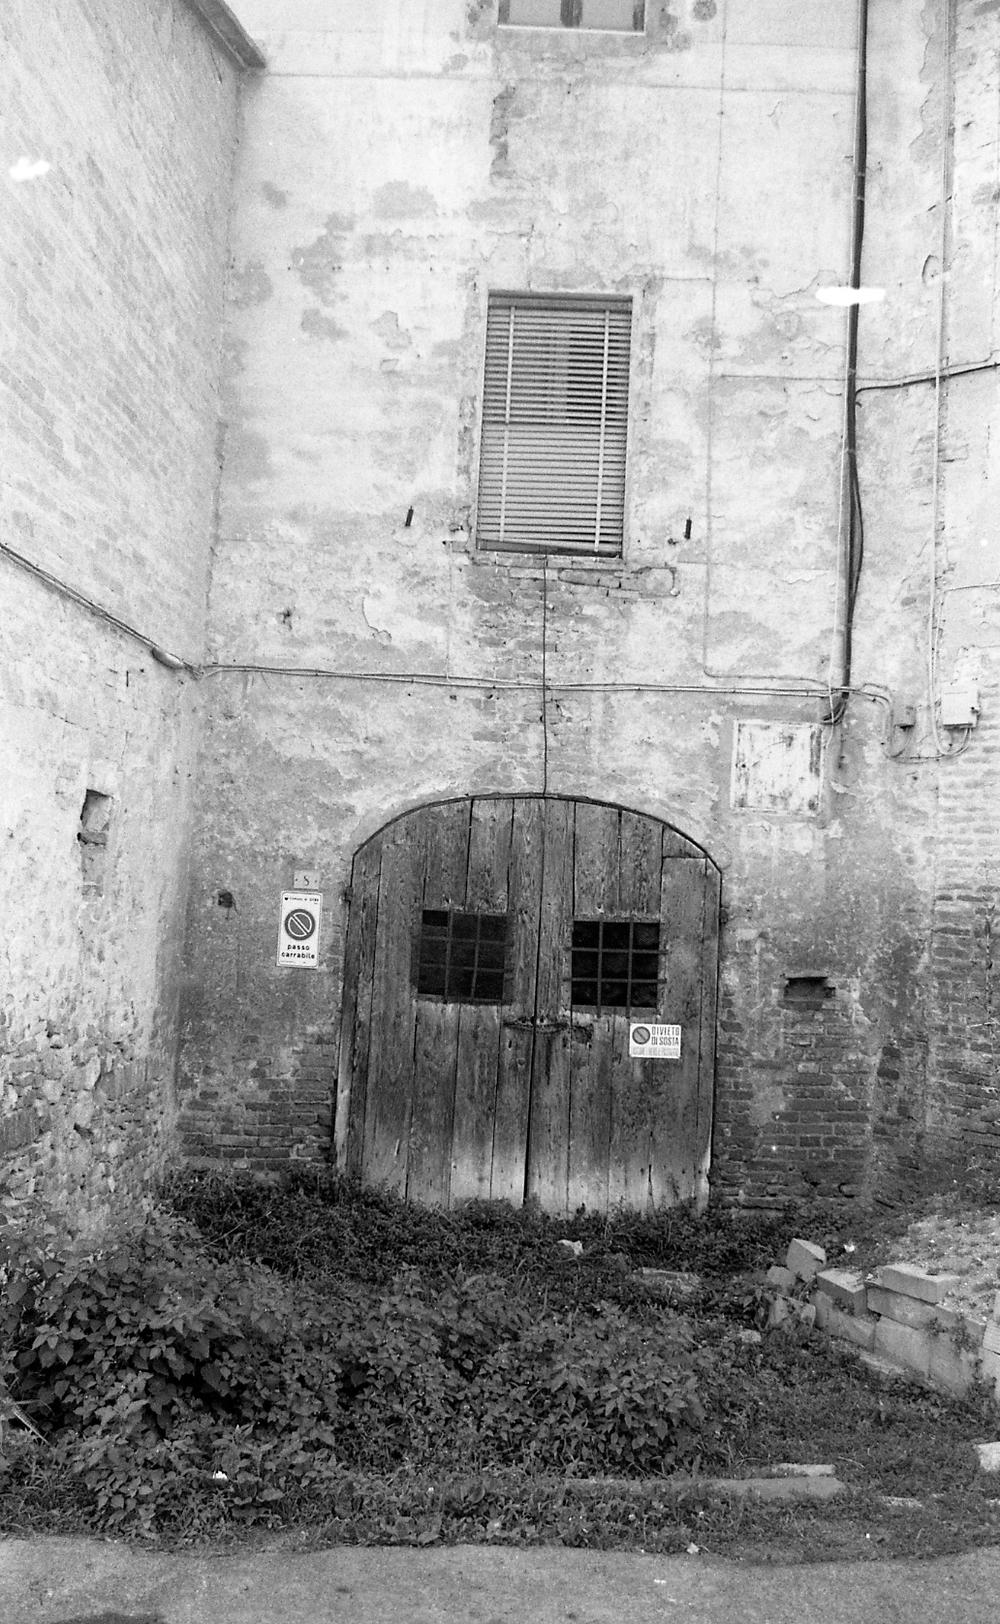 passageway. 35mm.